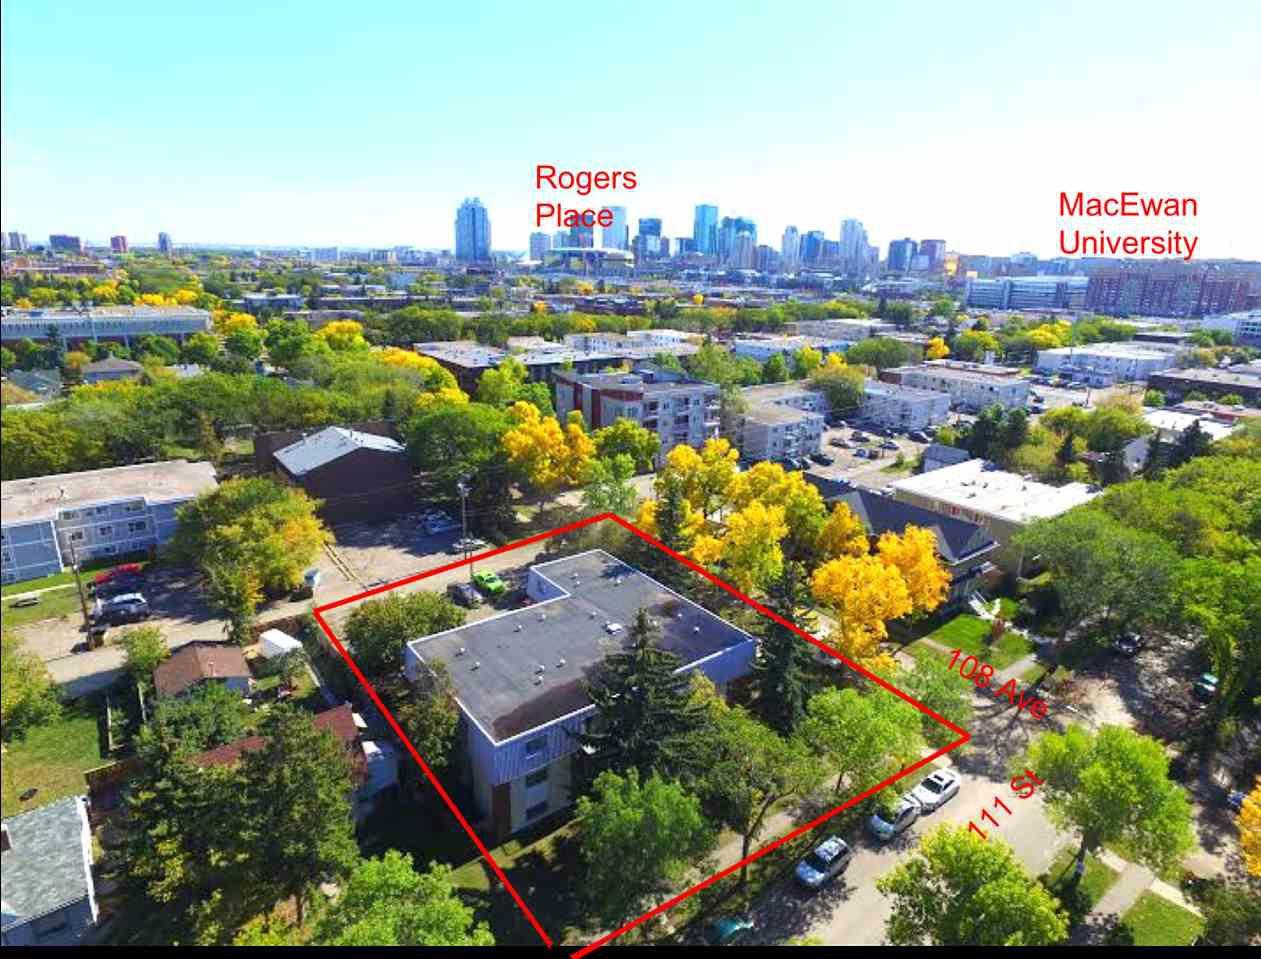 Main Photo: 11140 108 Avenue in Edmonton: Zone 08 Multi-Family Commercial for sale : MLS®# E4153437